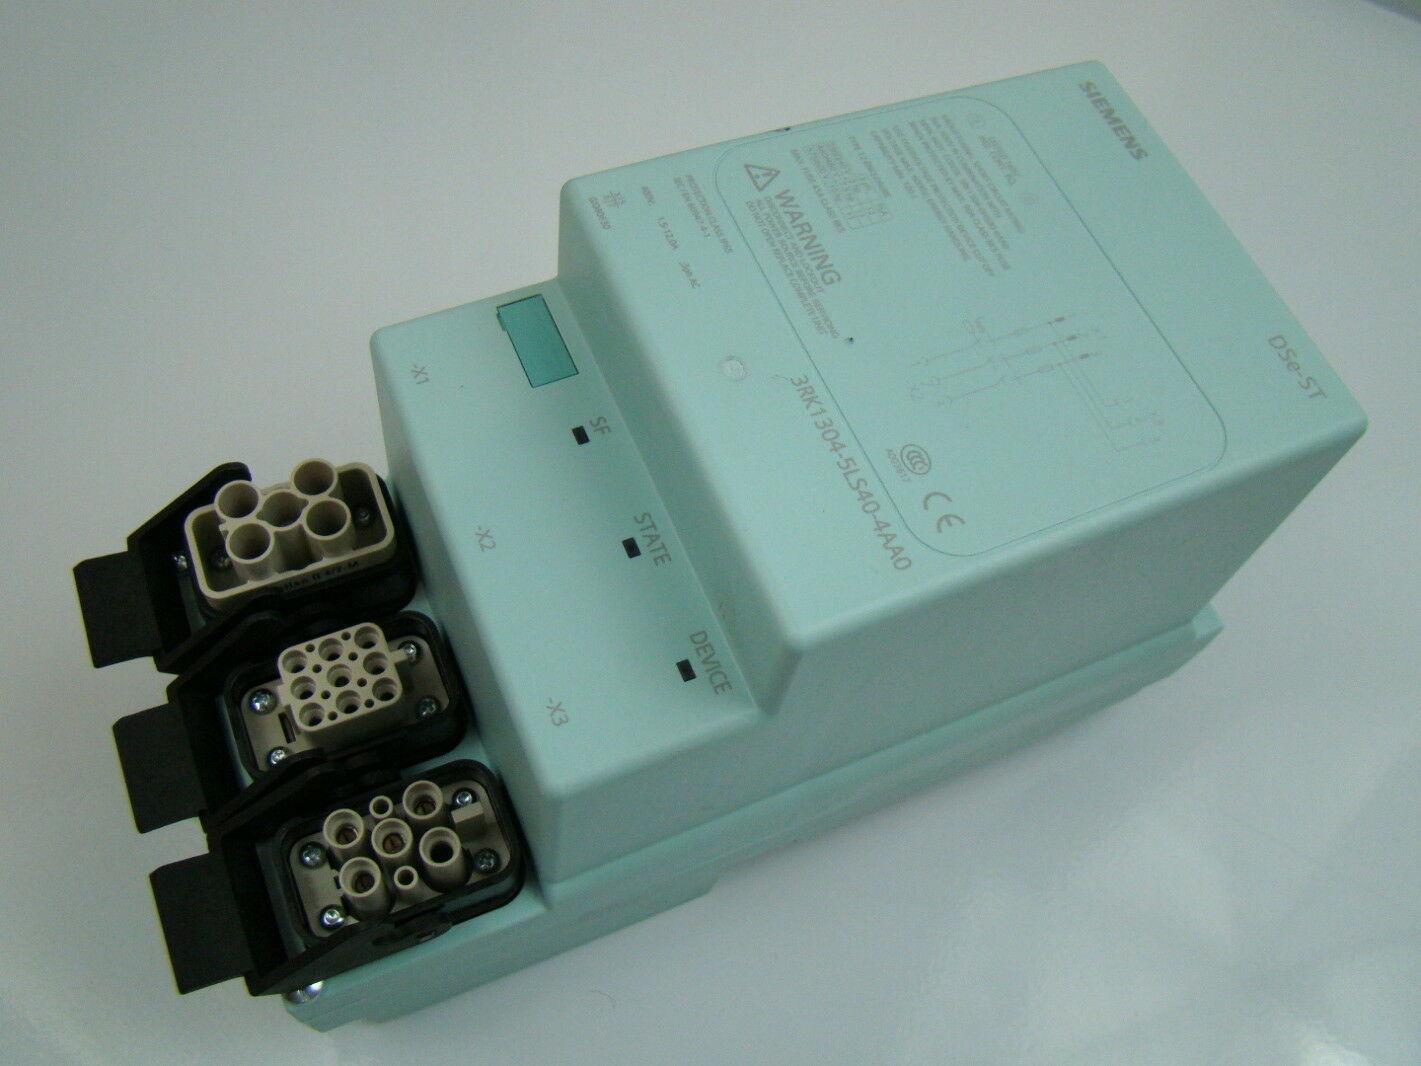 Siemens ET 200pro Motor Starter 3RK1304-5LS40-4AA0 | eBay